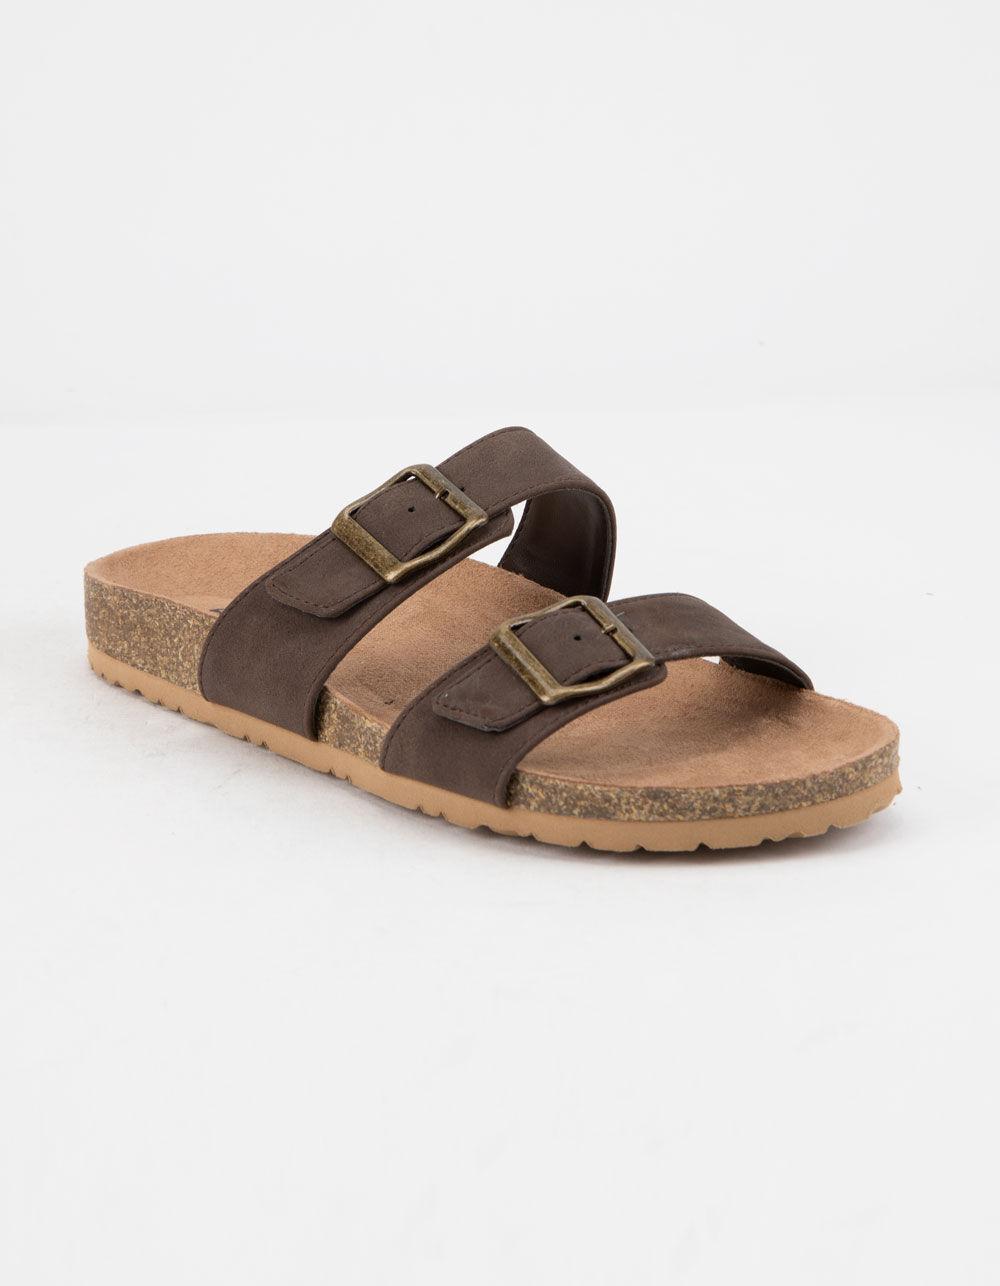 SODA Double Buckle Brown Slide Sandals